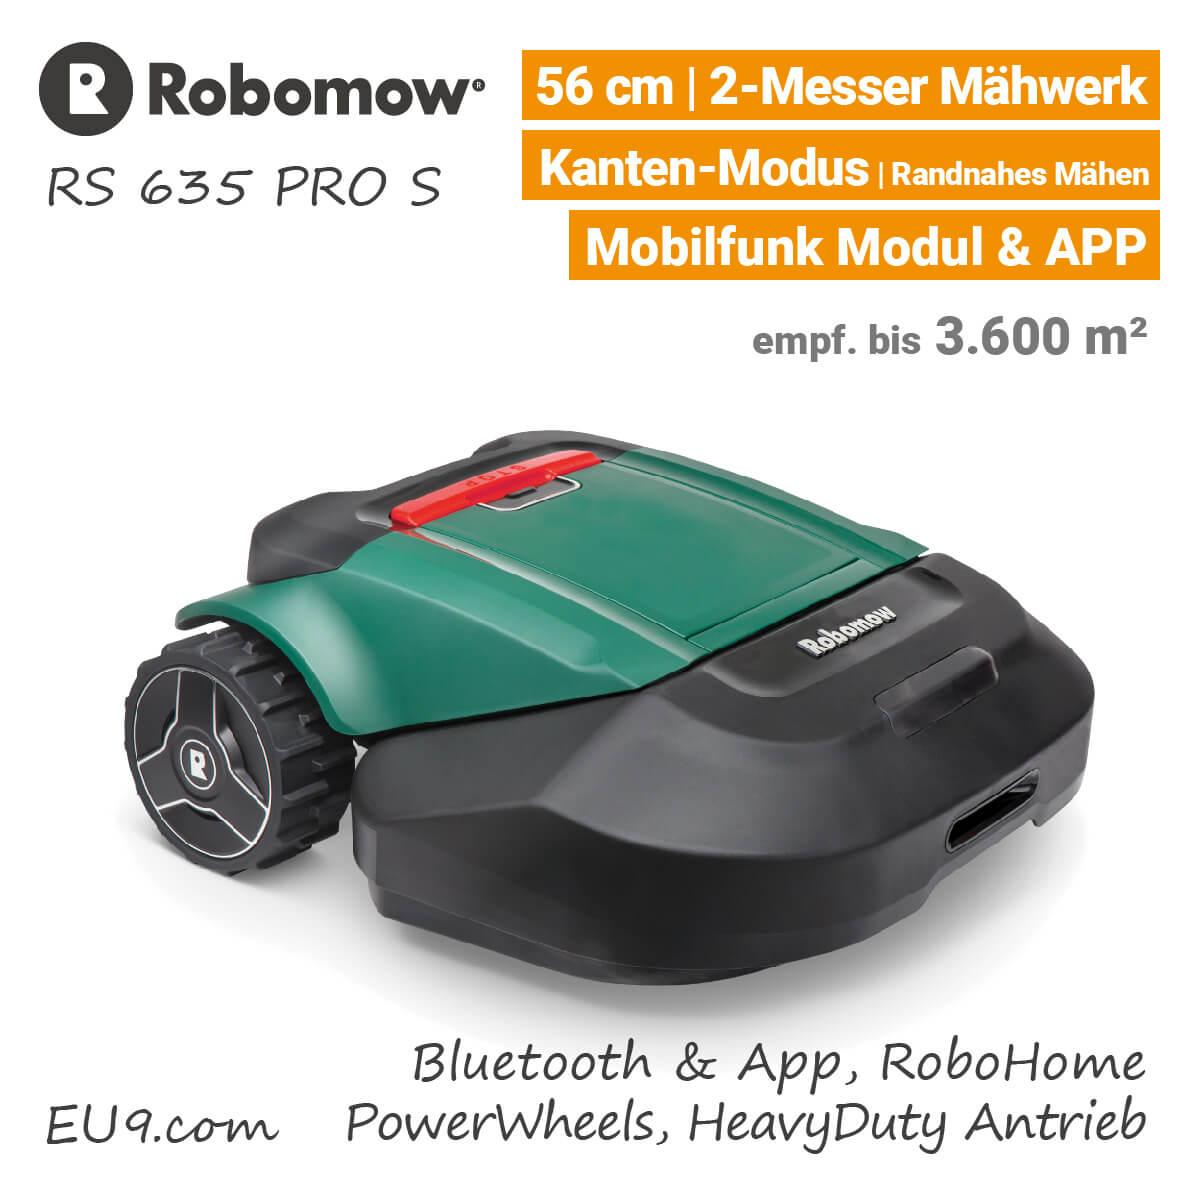 neu 2018 robomow rs 635 pro s m hroboter mit robohome tipp. Black Bedroom Furniture Sets. Home Design Ideas